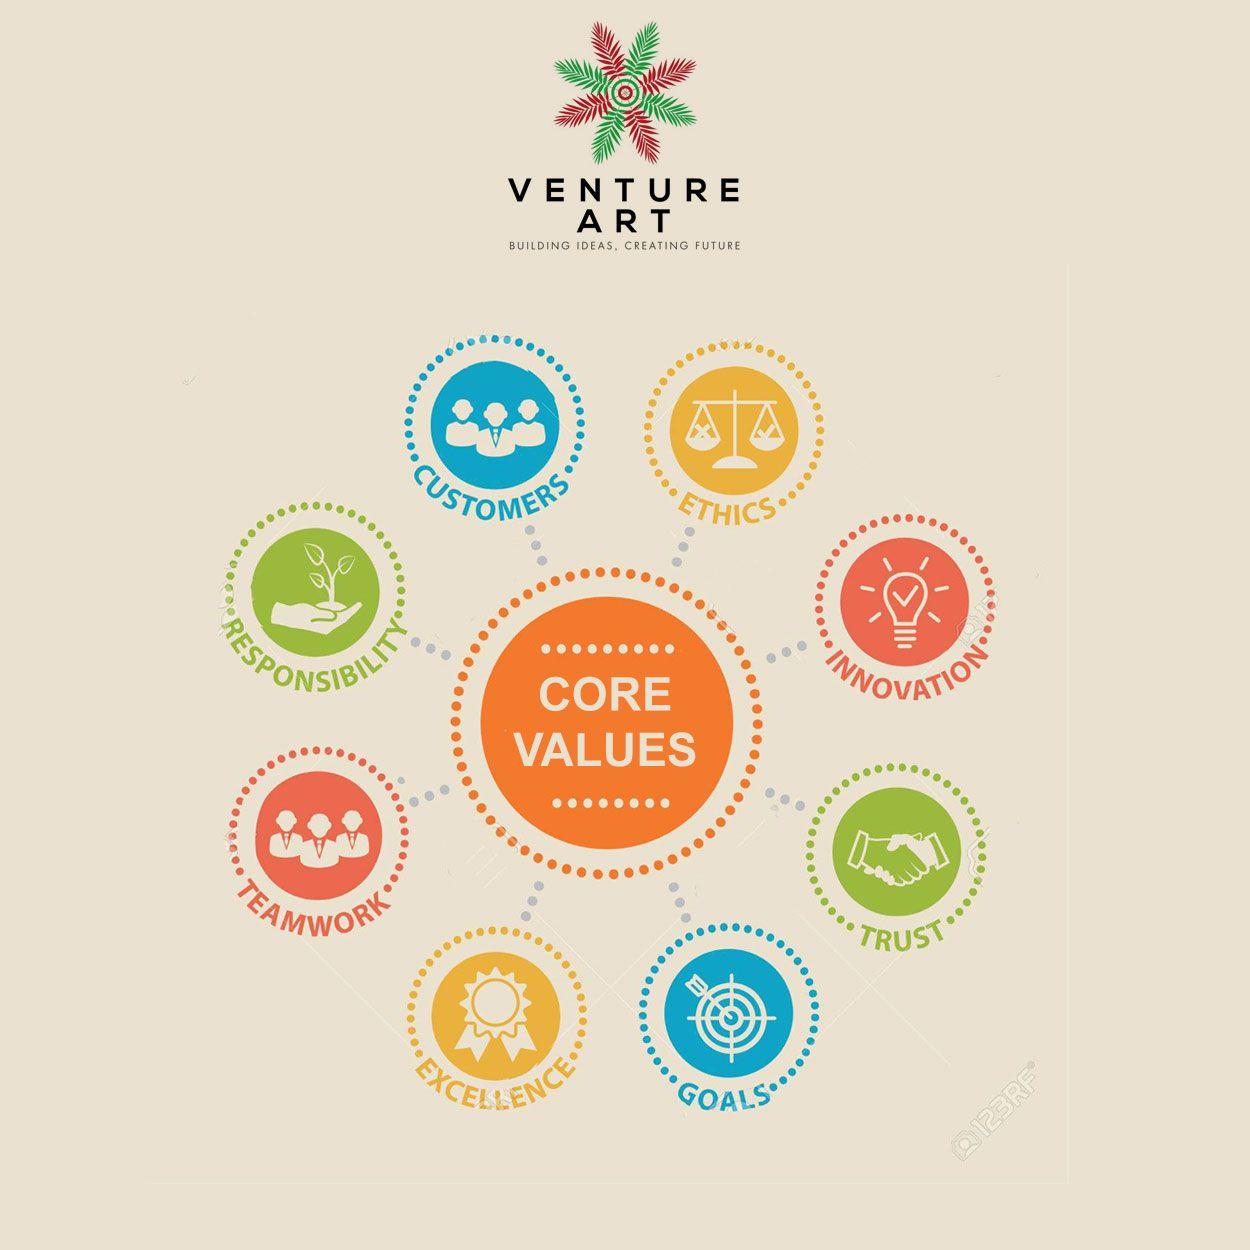 Core Values In Business Company Core Values Core Values Branding Advice